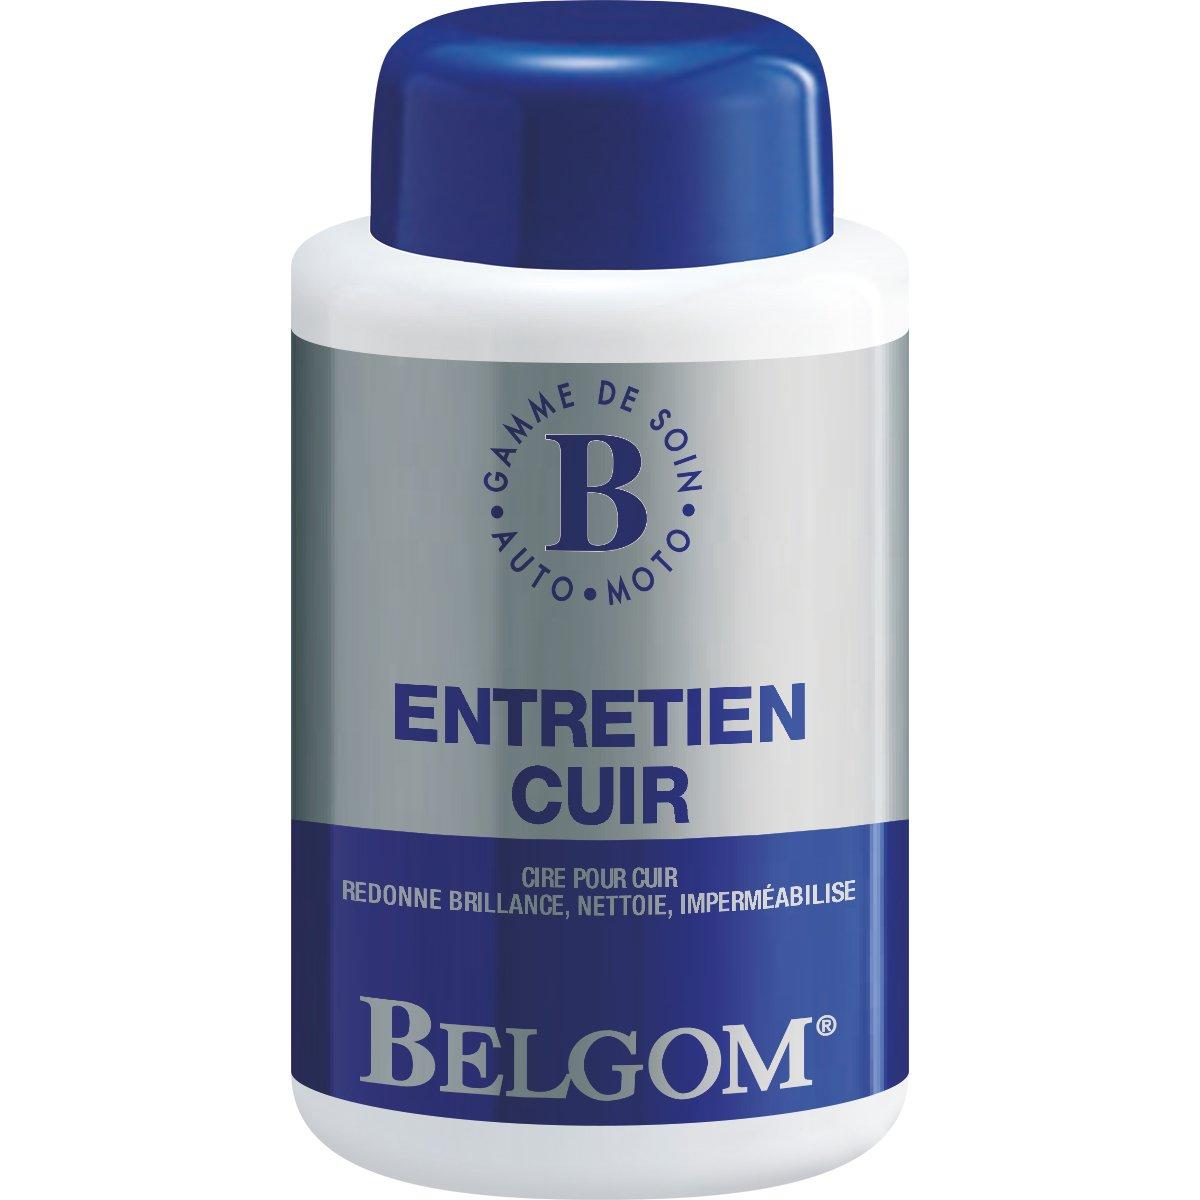 Belgom 11.0250 Entretien Cuir, 250 ML Soditen